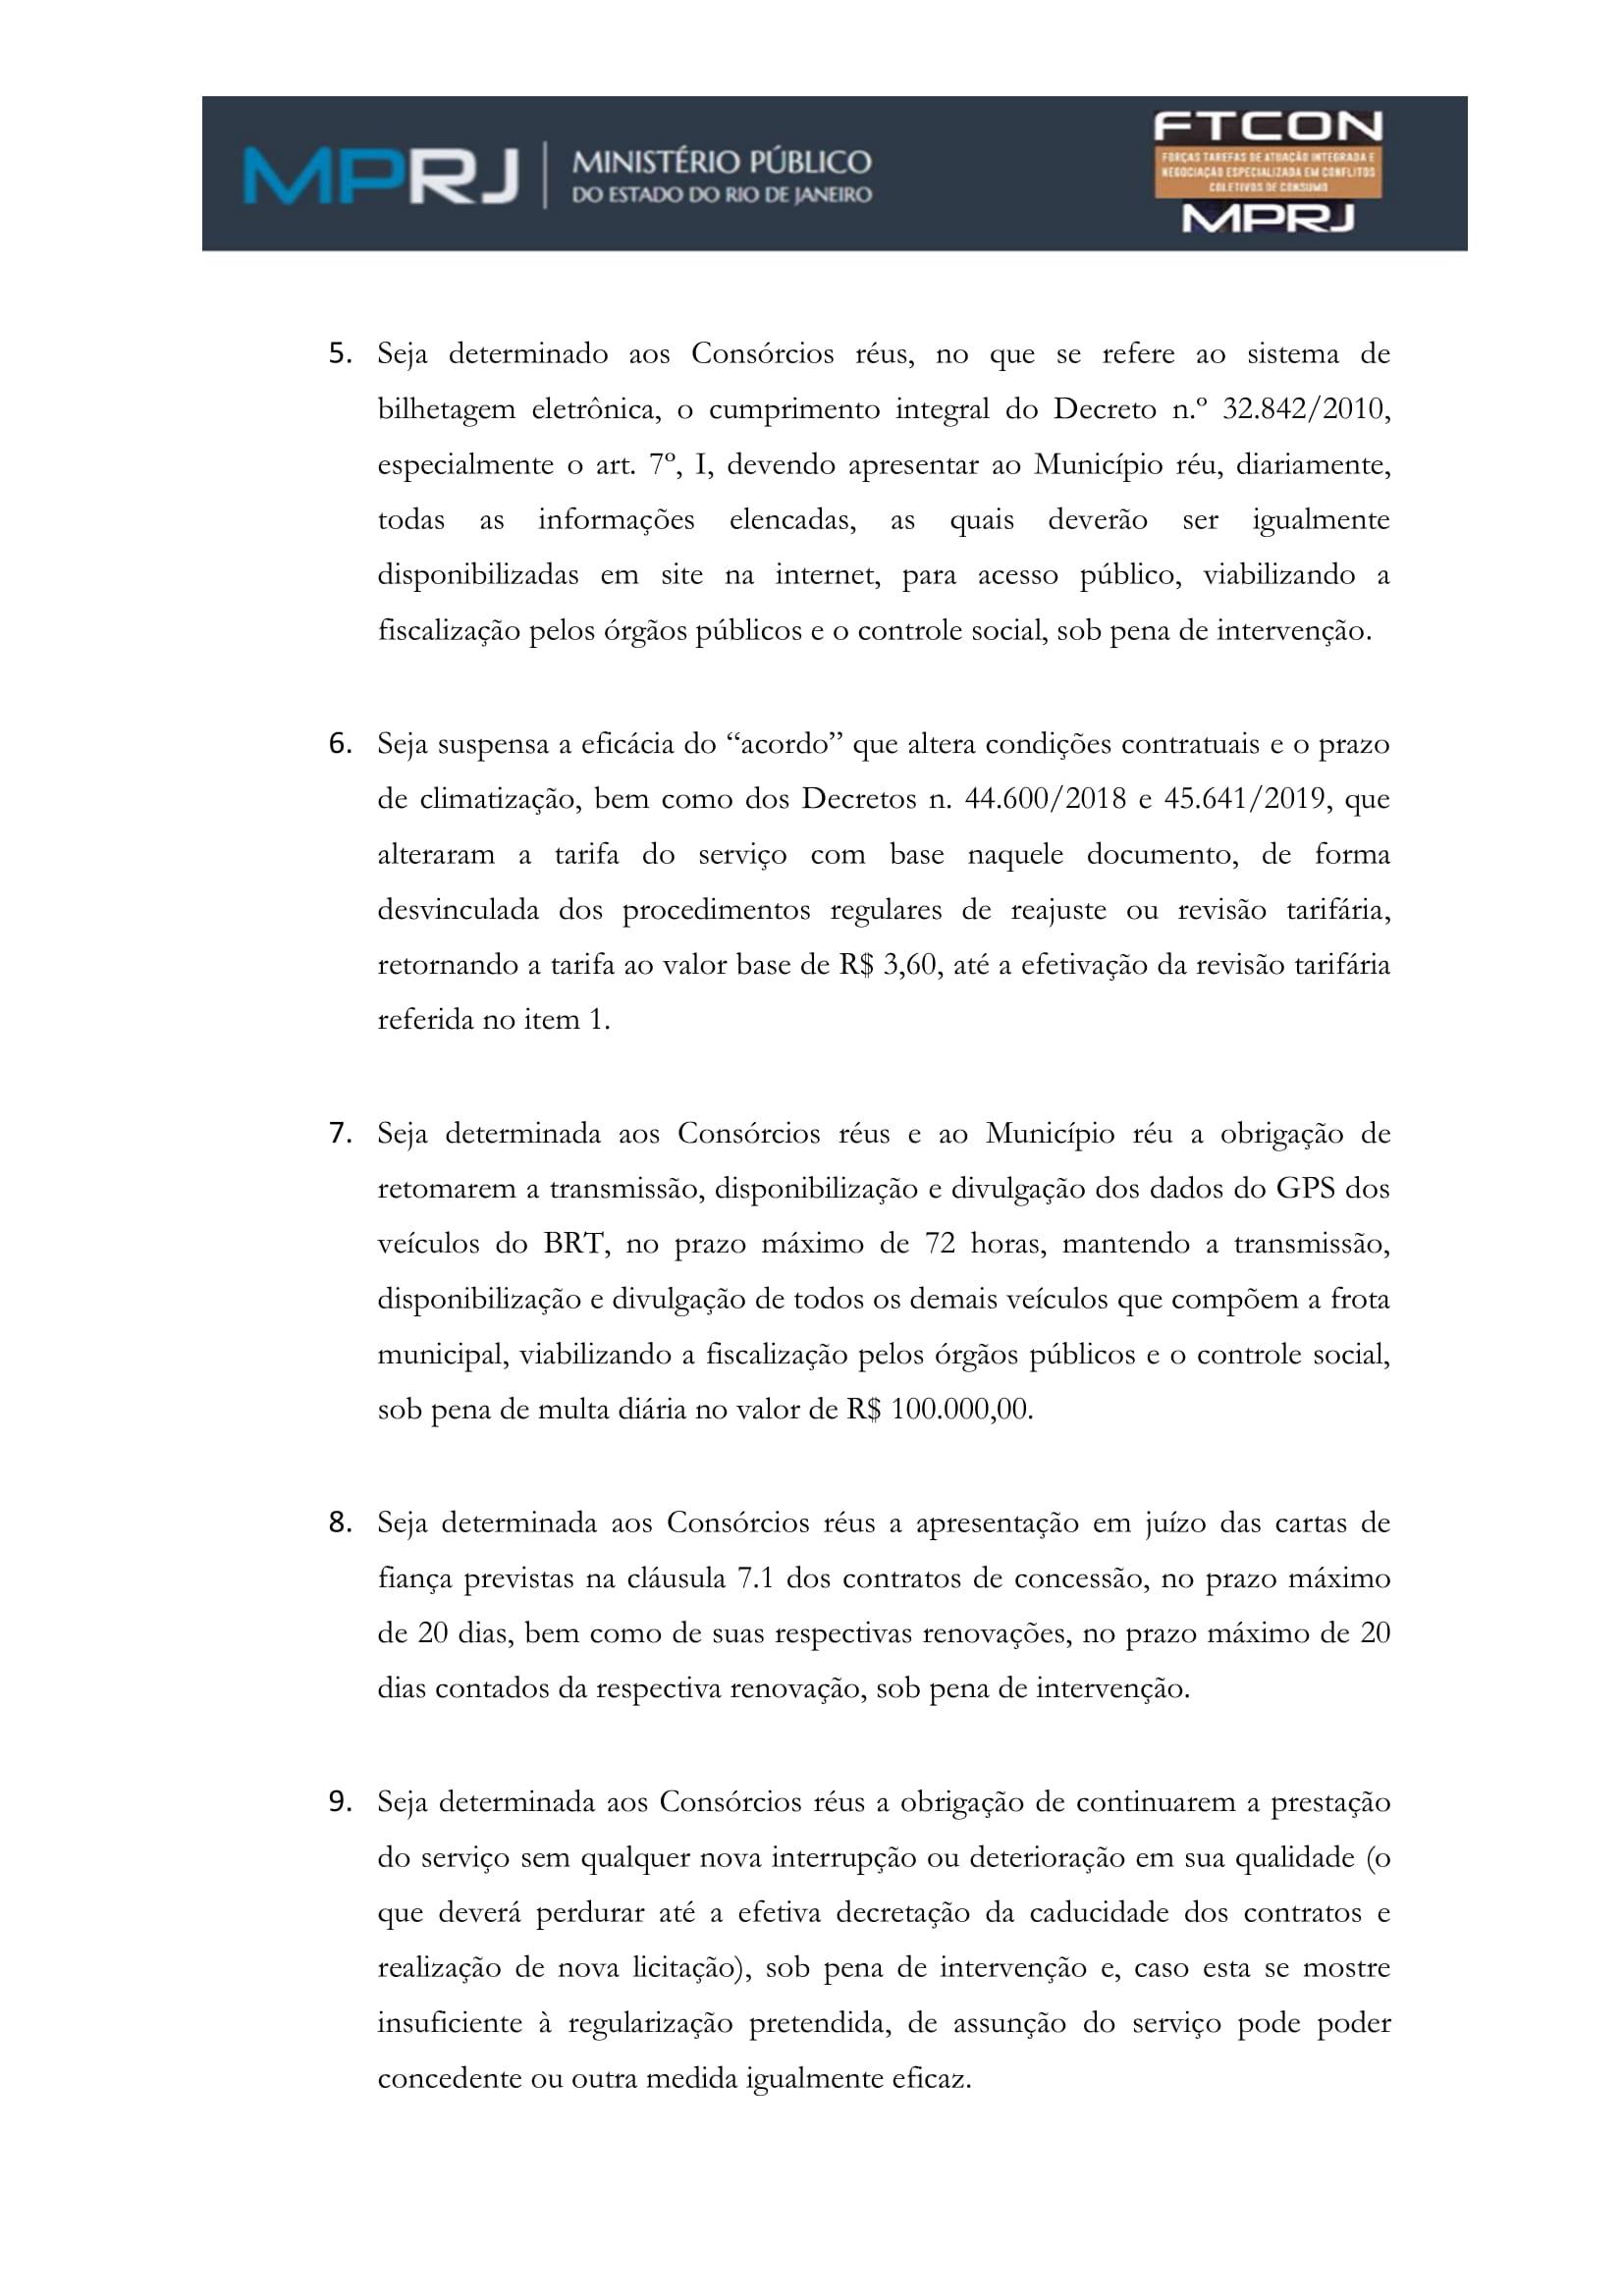 acp_caducidade_onibus_dr_rt-135